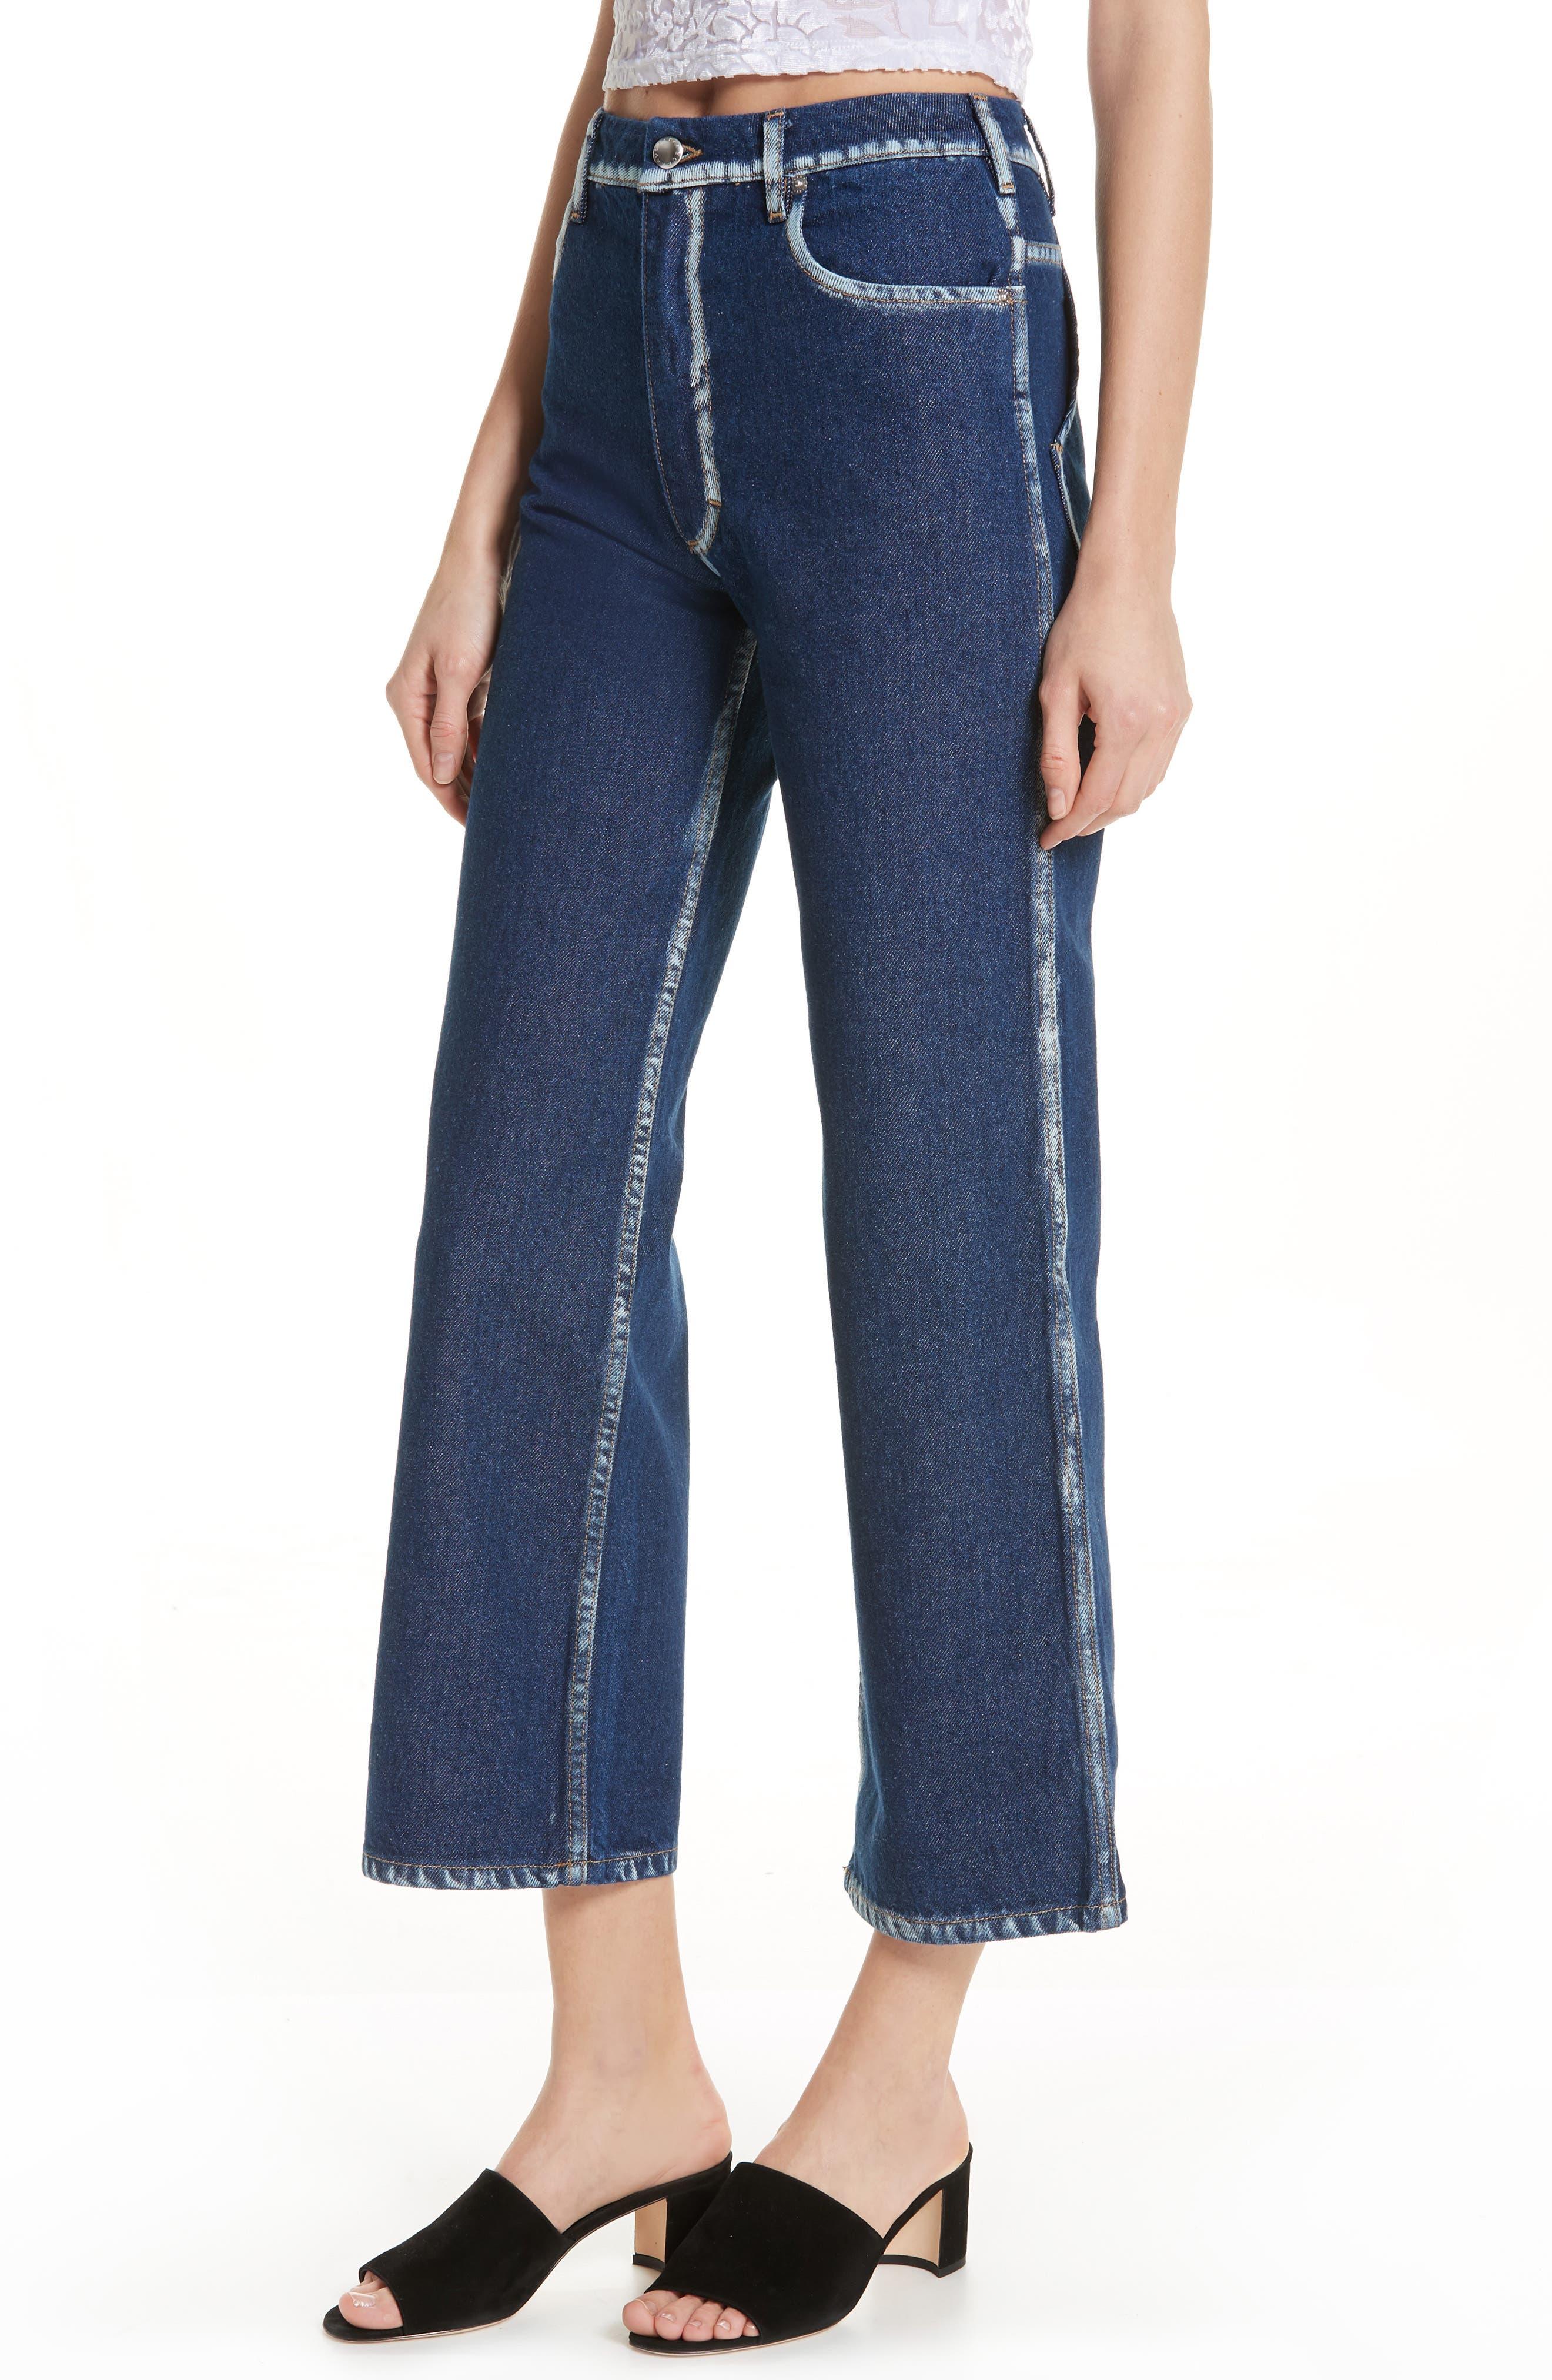 EL Painted Seam Wide Leg Jeans,                             Alternate thumbnail 4, color,                             BLUE SEAM PAINTING